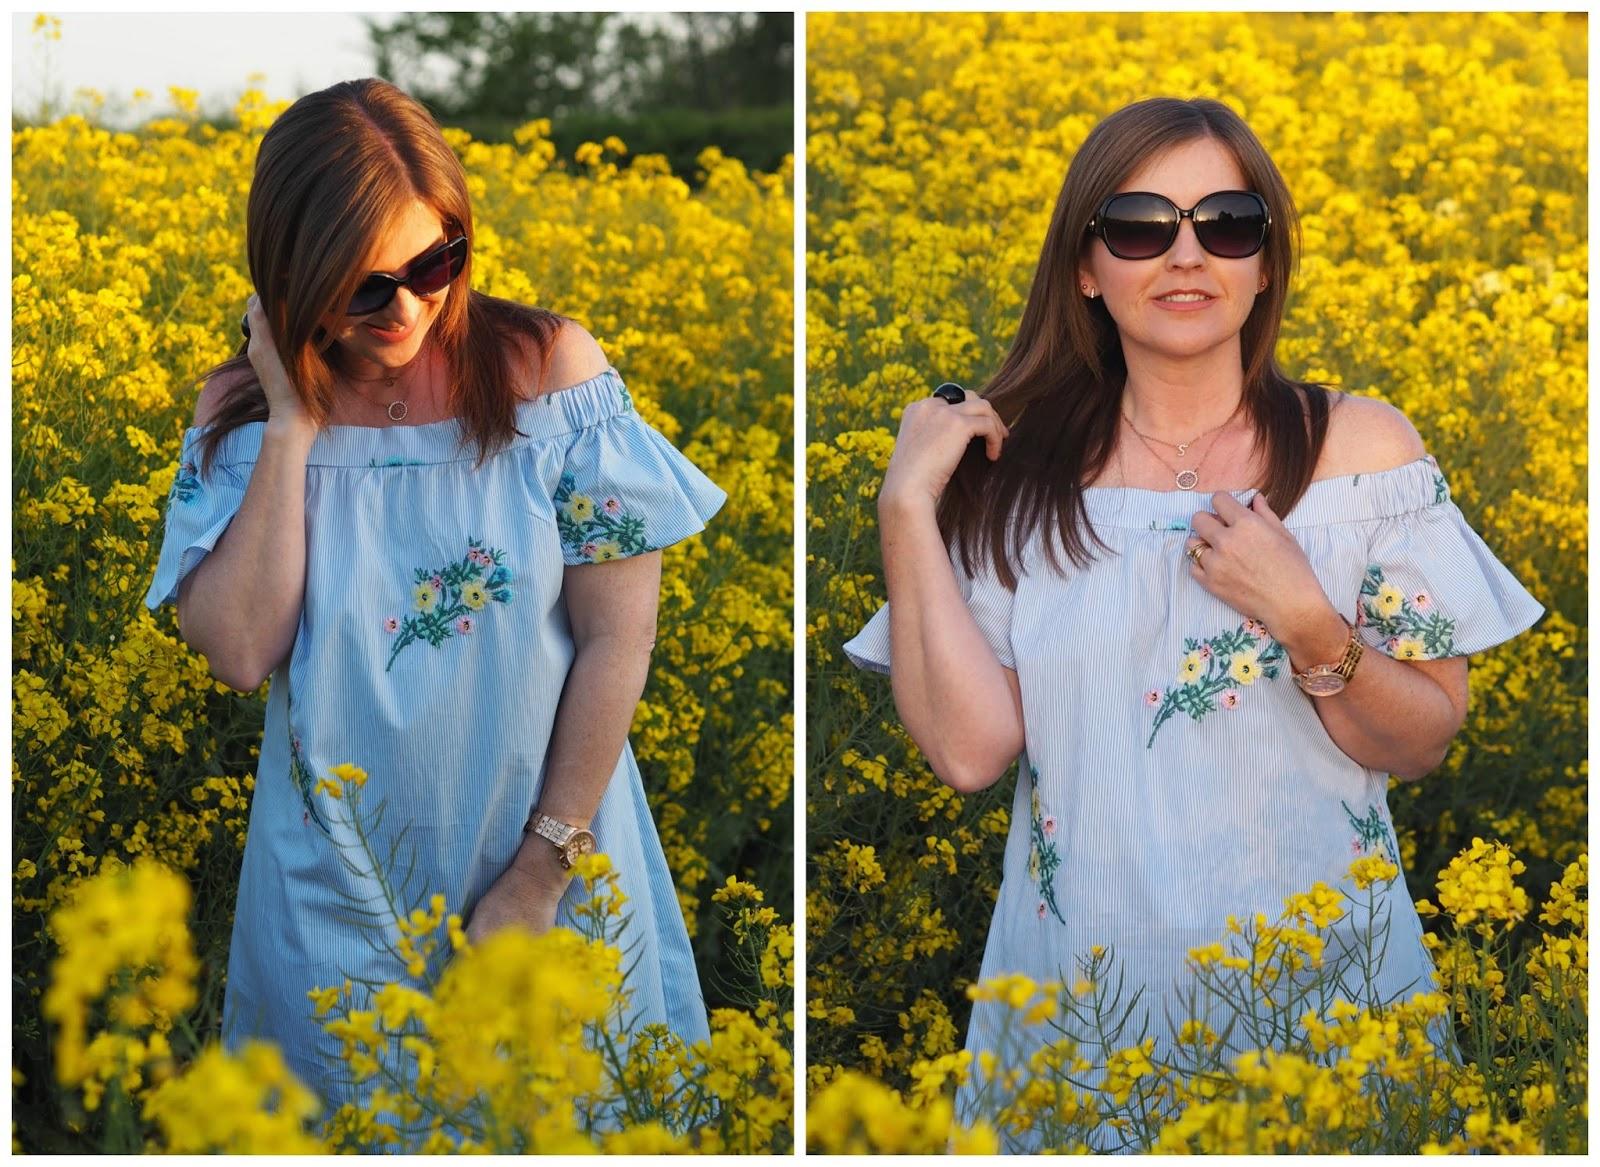 New Look off the shoulder dress \ bardot \ fashion \ style \ styleblog \ Priceless Life of Mine \ Over 40 lifestyle blog